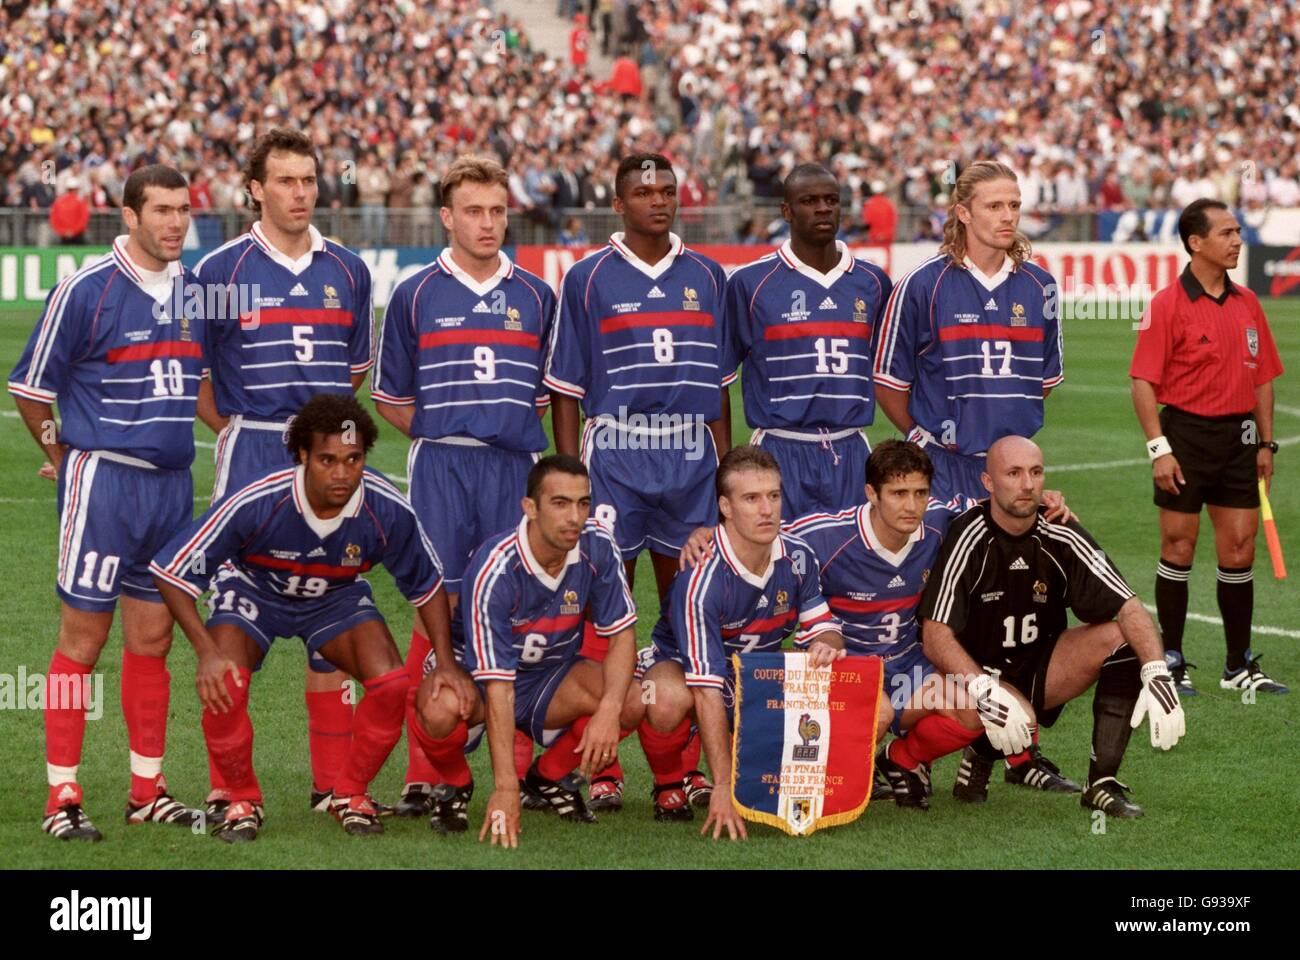 e29b8ce4aa7 Soccer - World Cup France 98 - Semi Final - France v Croatia Stock ...